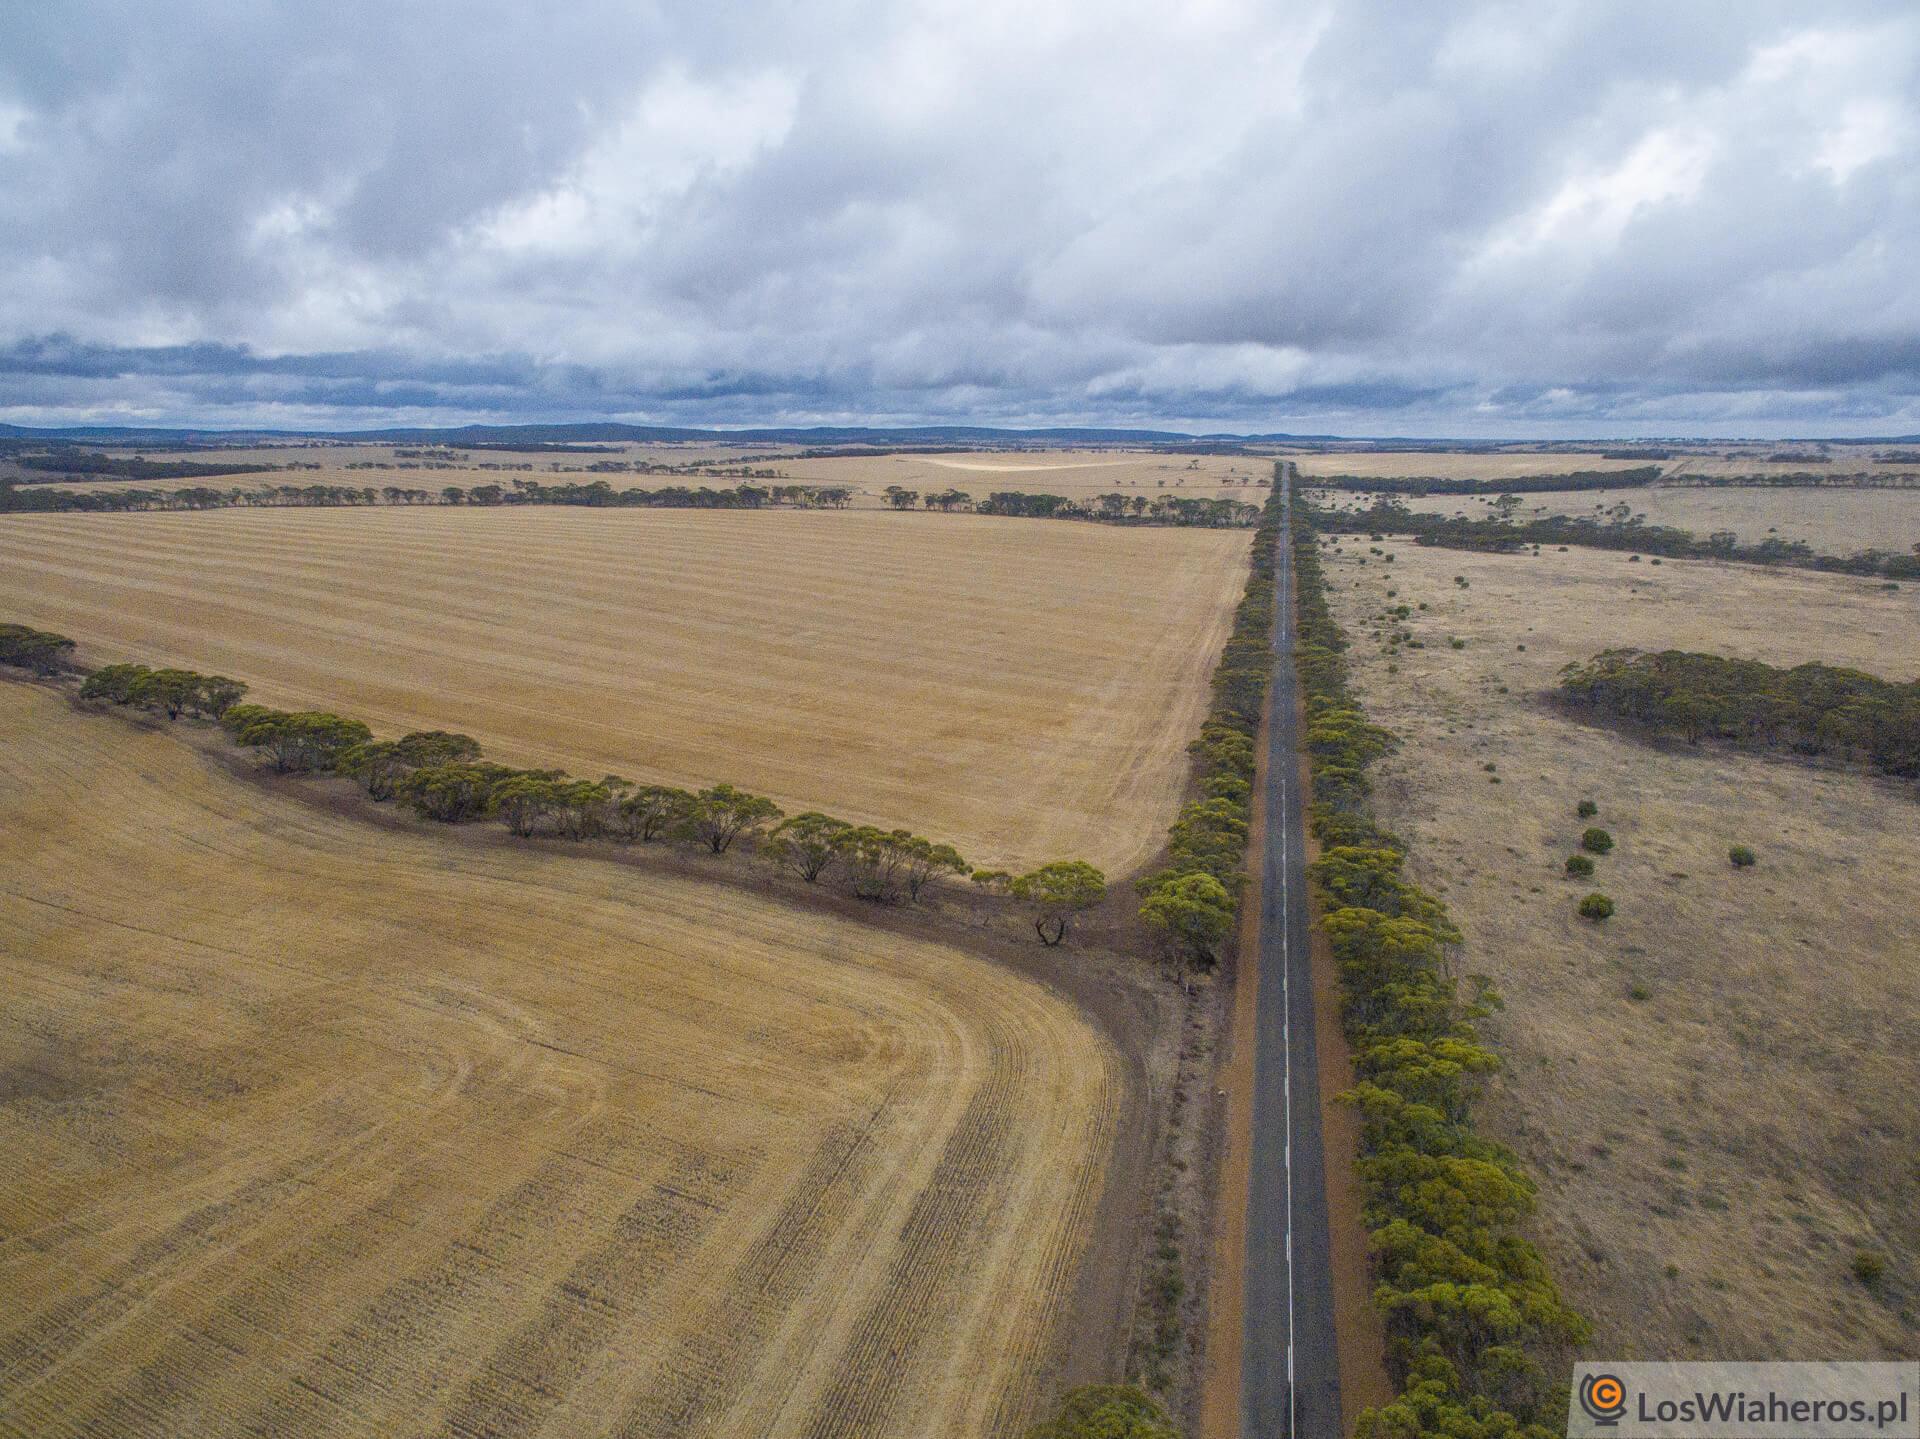 Południe Australii Zachodniej farmami stoi.